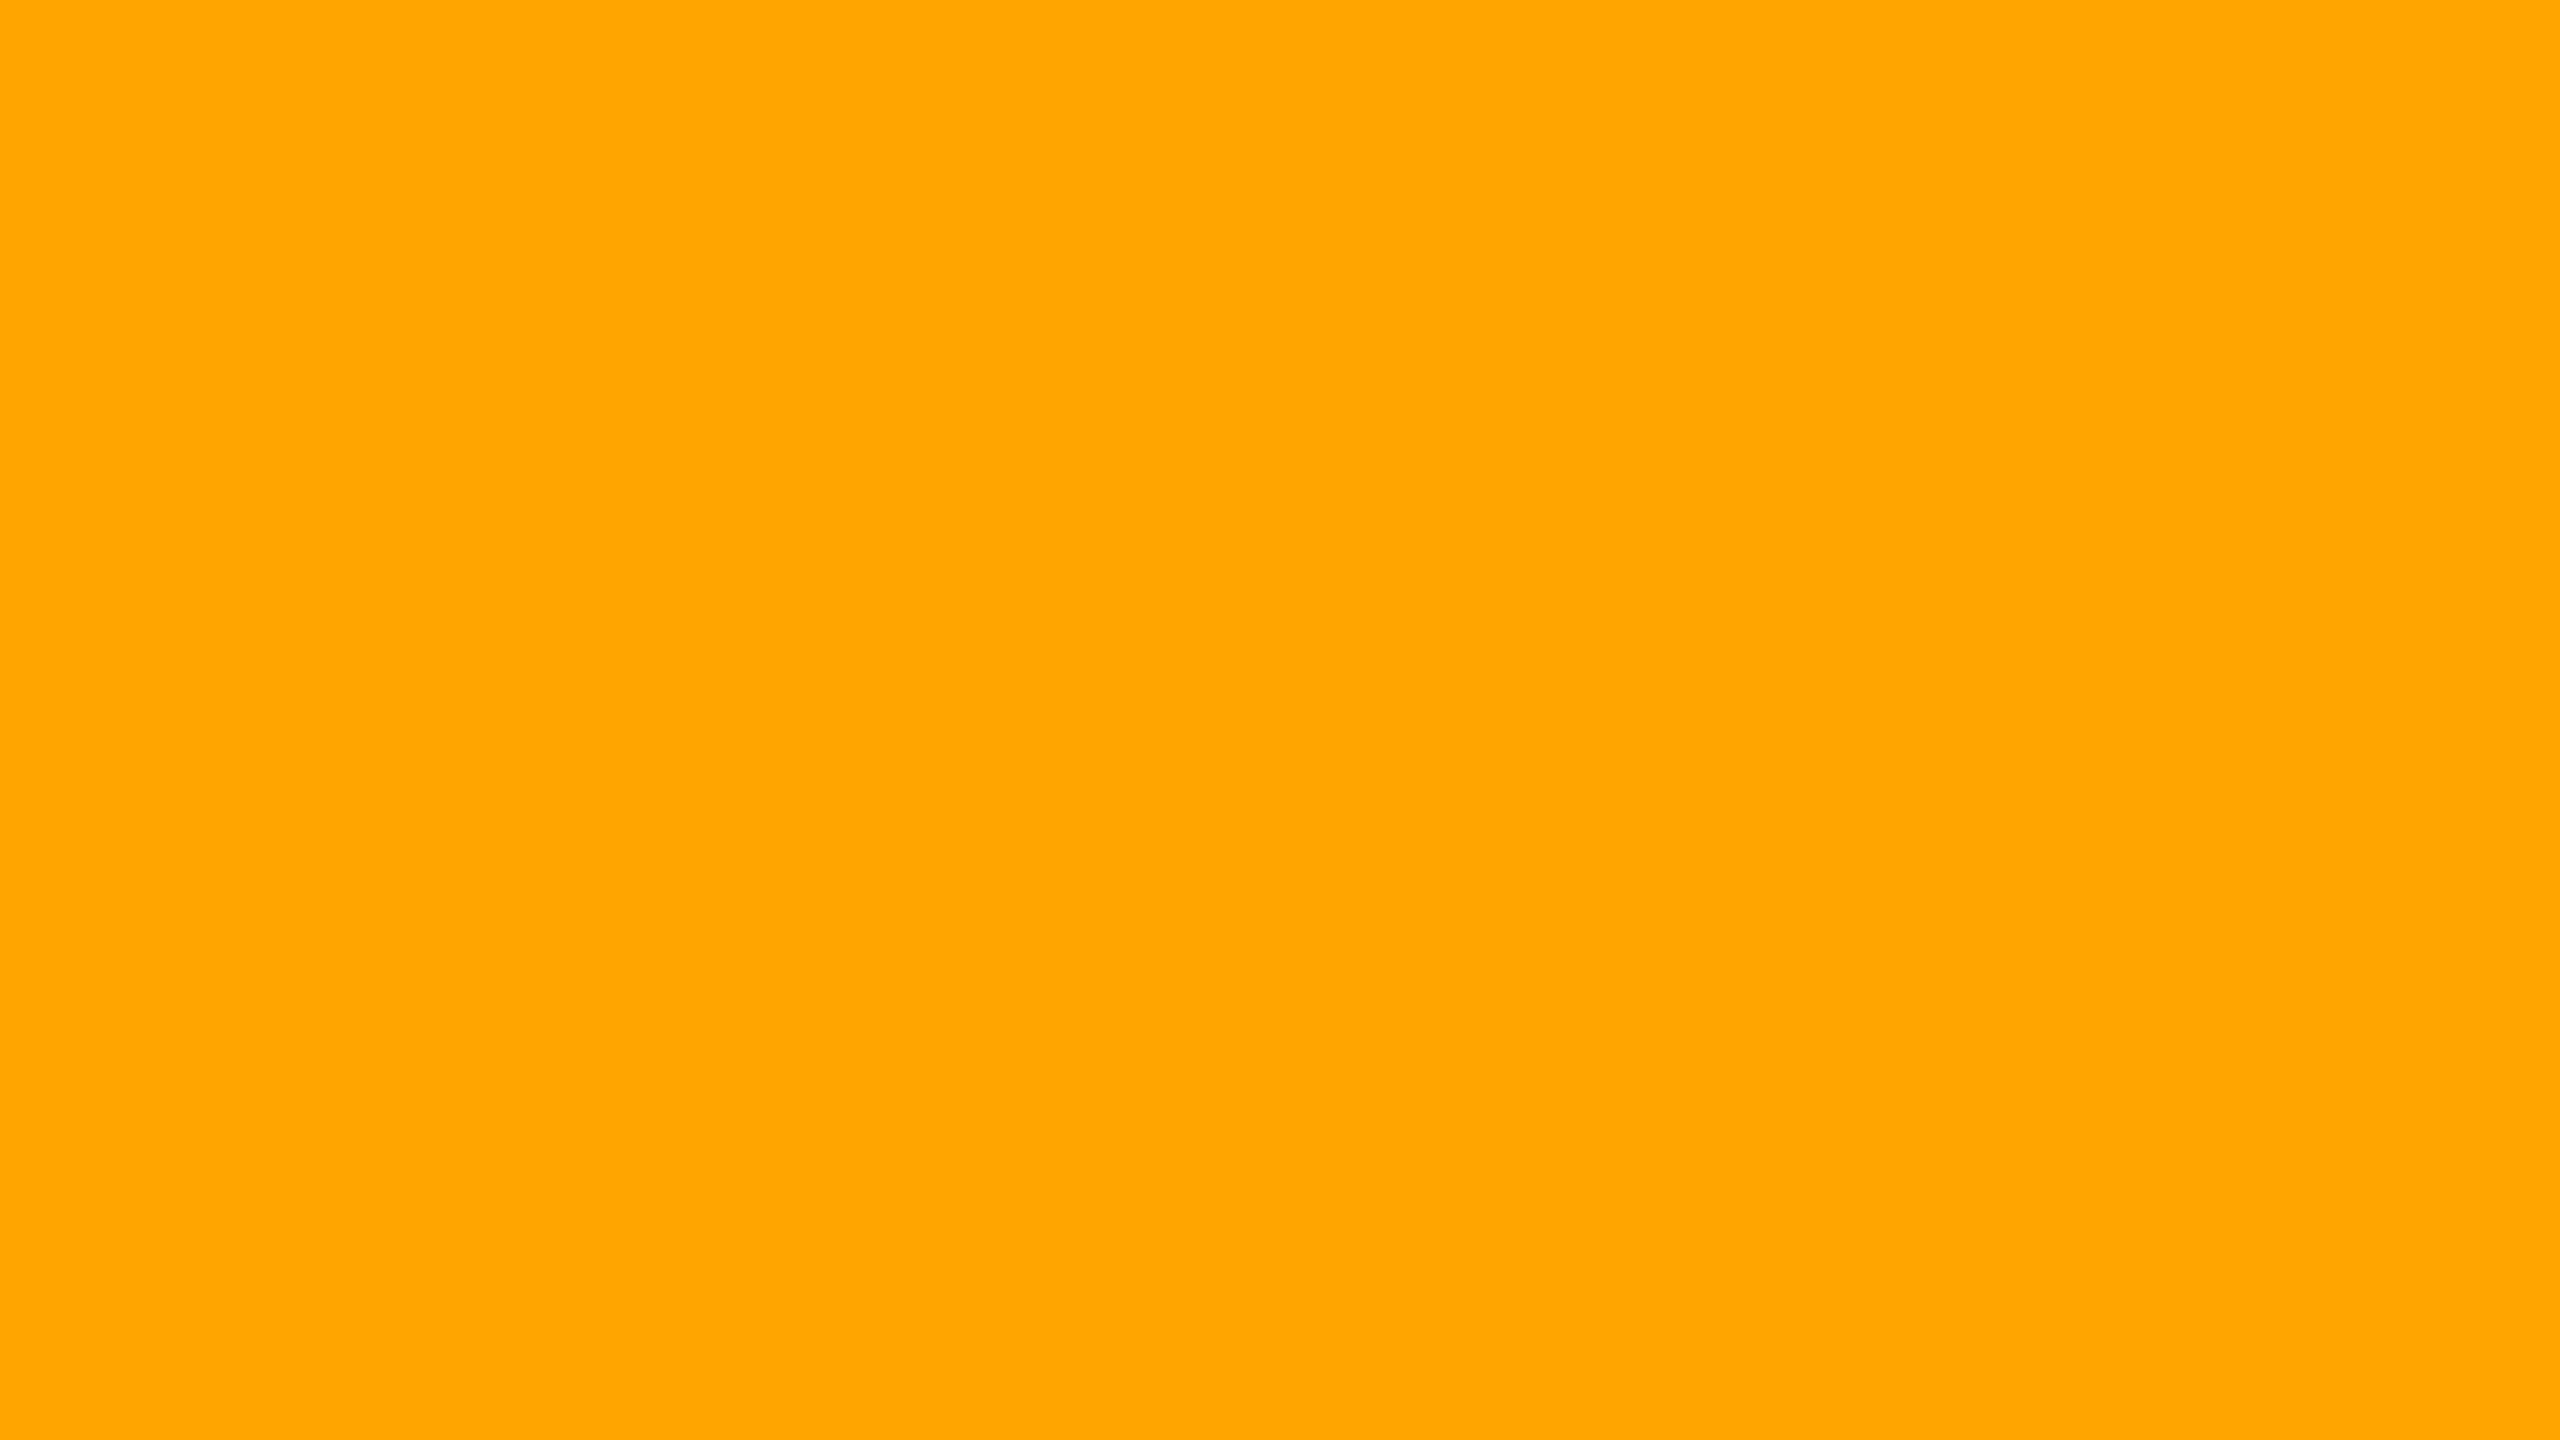 Www Wallpaper Com Free Download Hd 2560x1440 Orange Web Solid Color Background